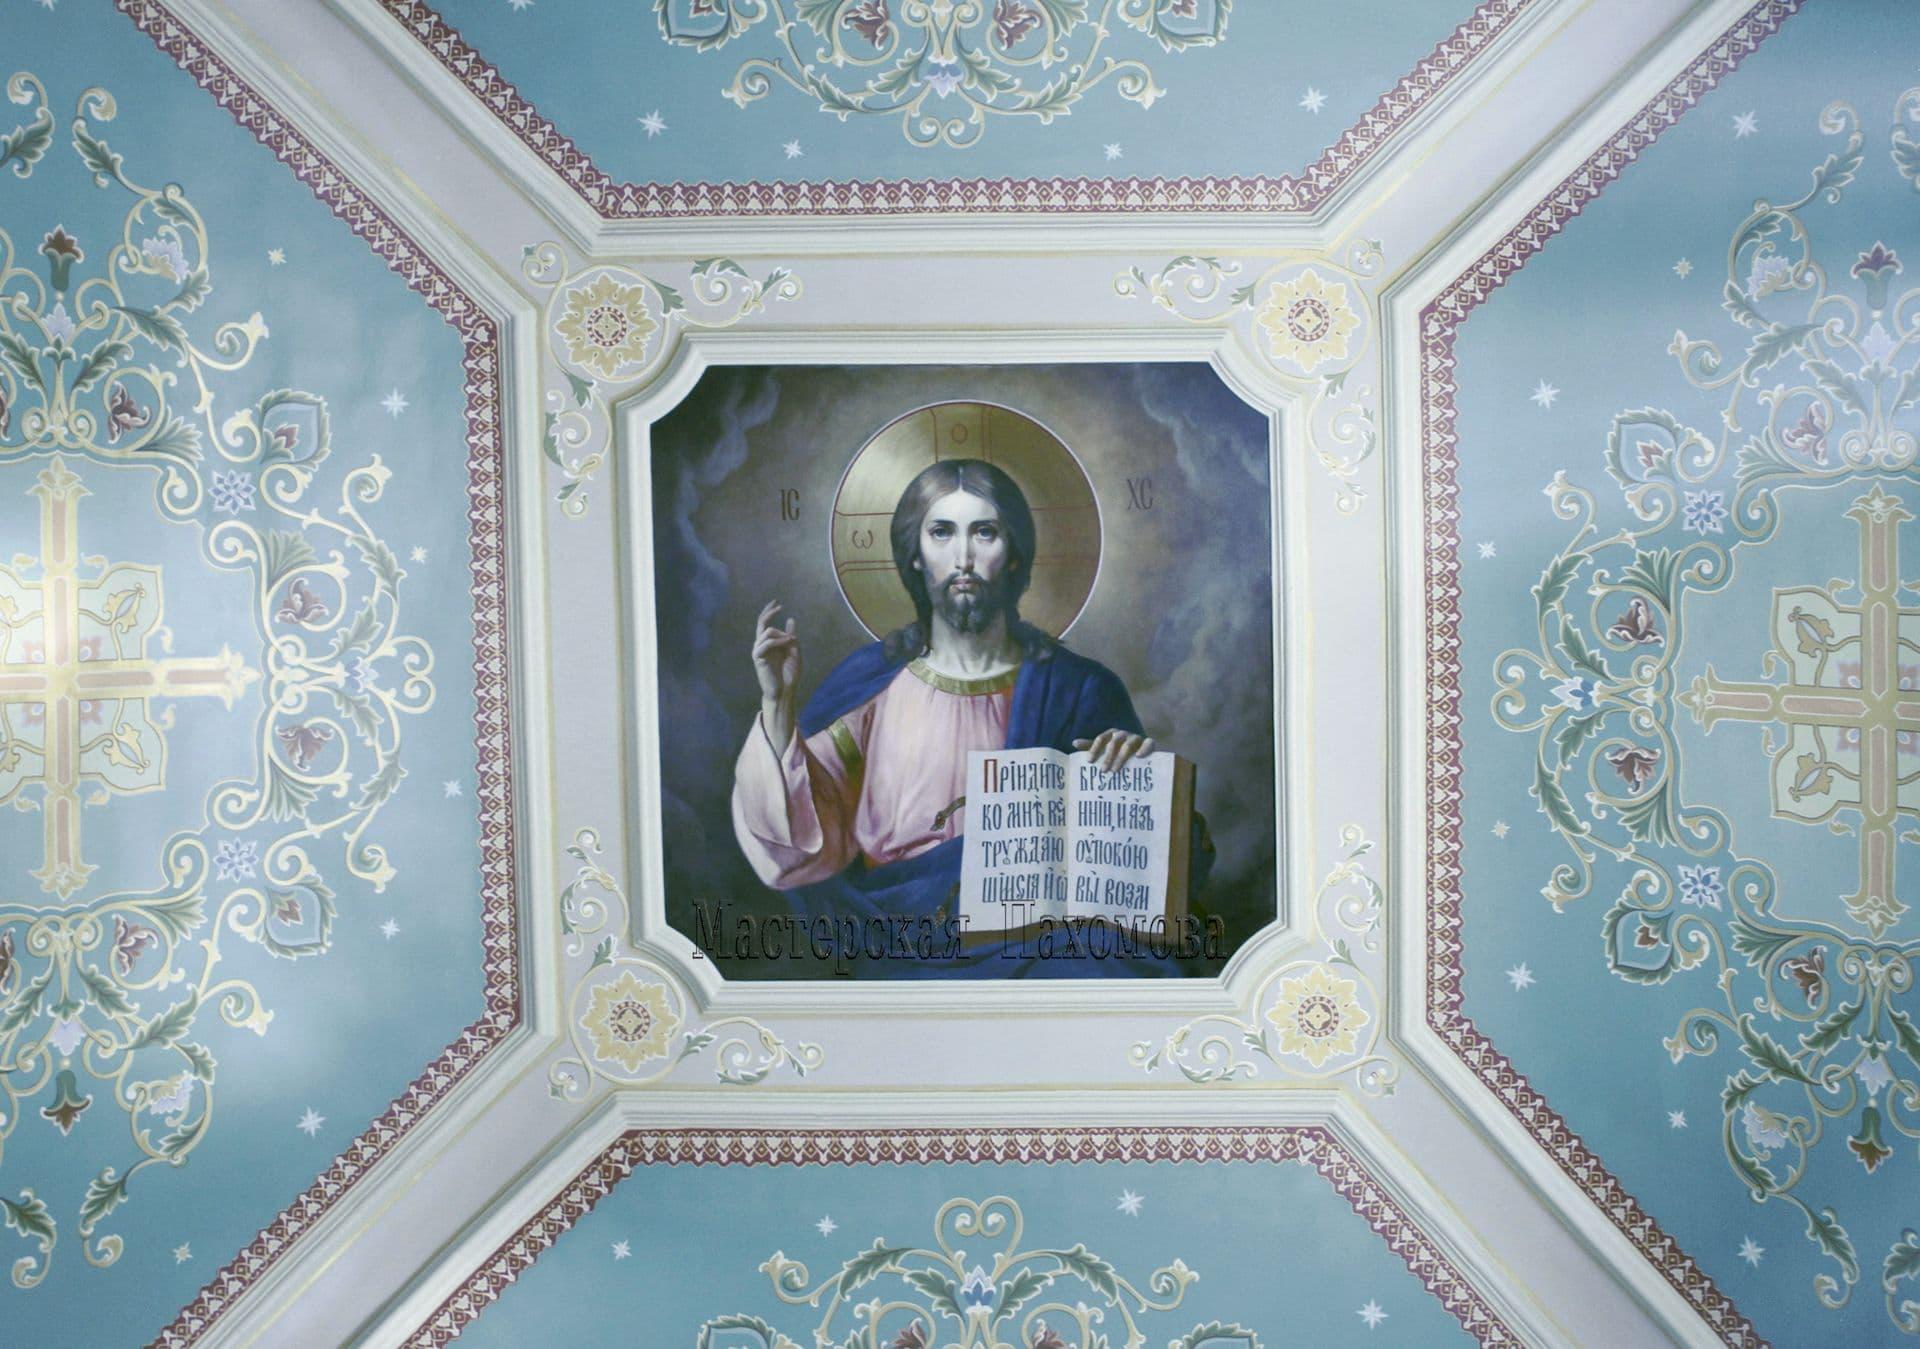 Потолочная роспись Храма, орнаментальная роспись Храма, стенопись в Храме